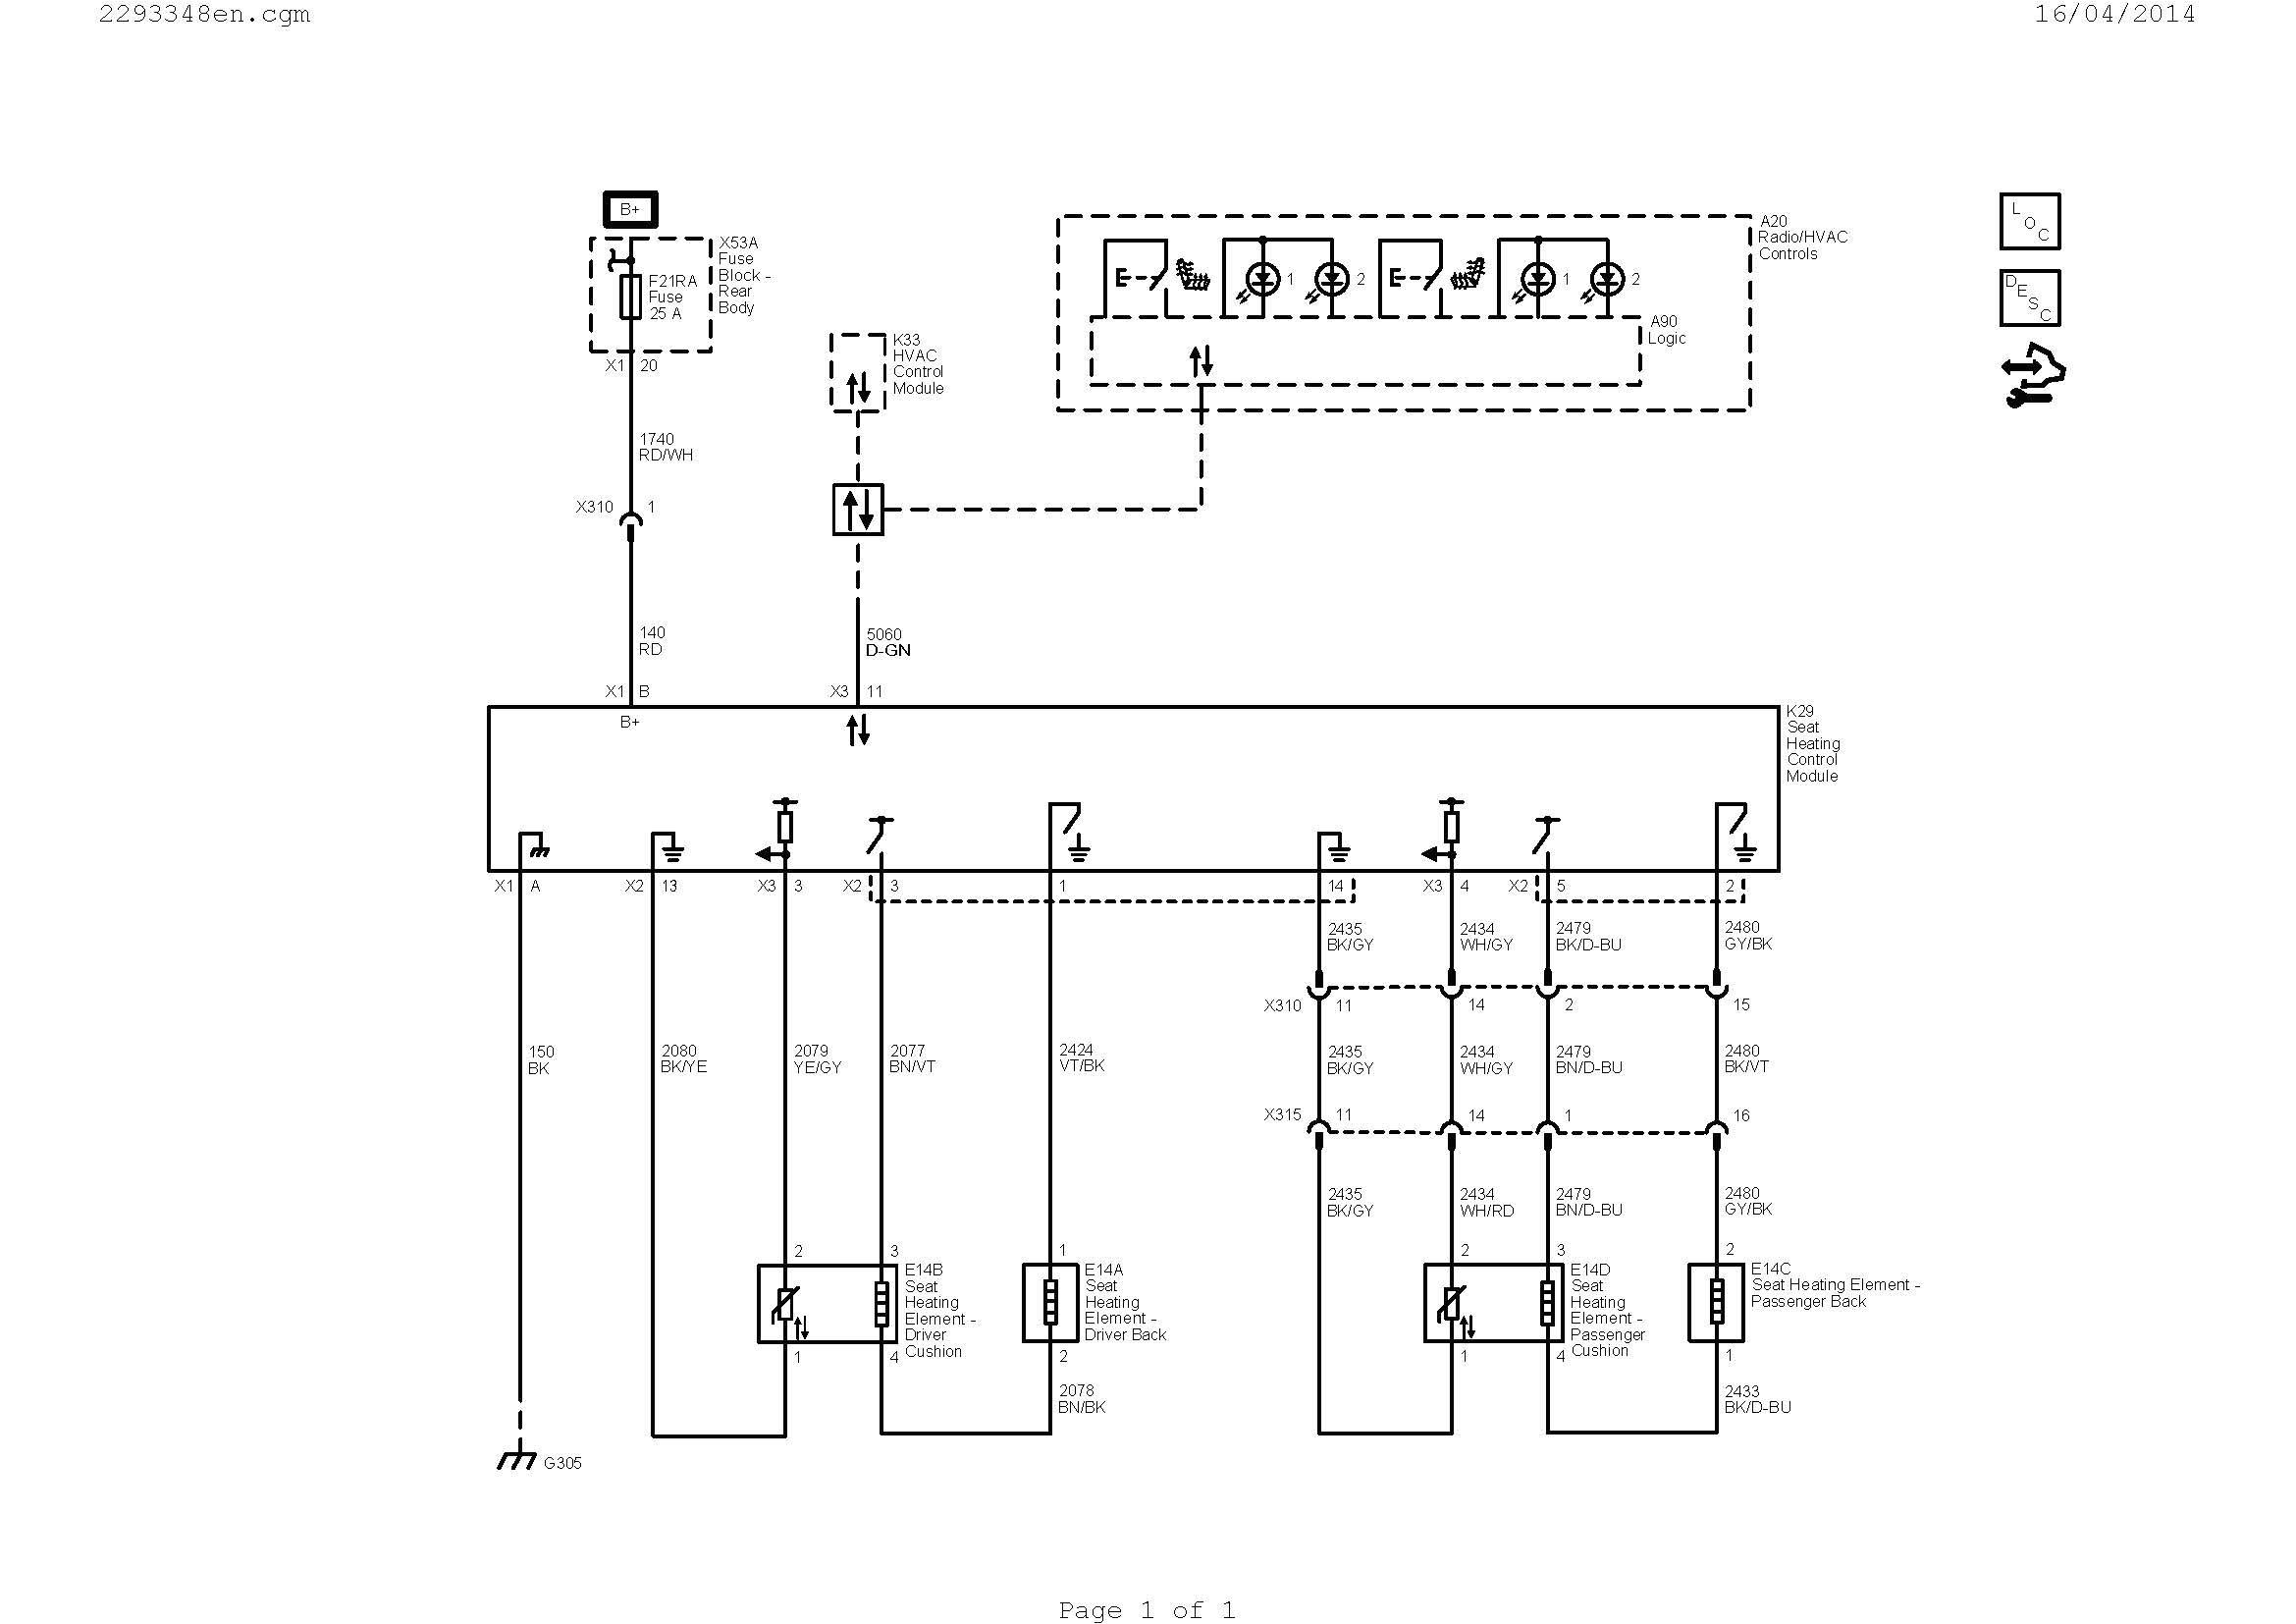 rv park wiring diagram wiring diagram inside wiring diagram rv park